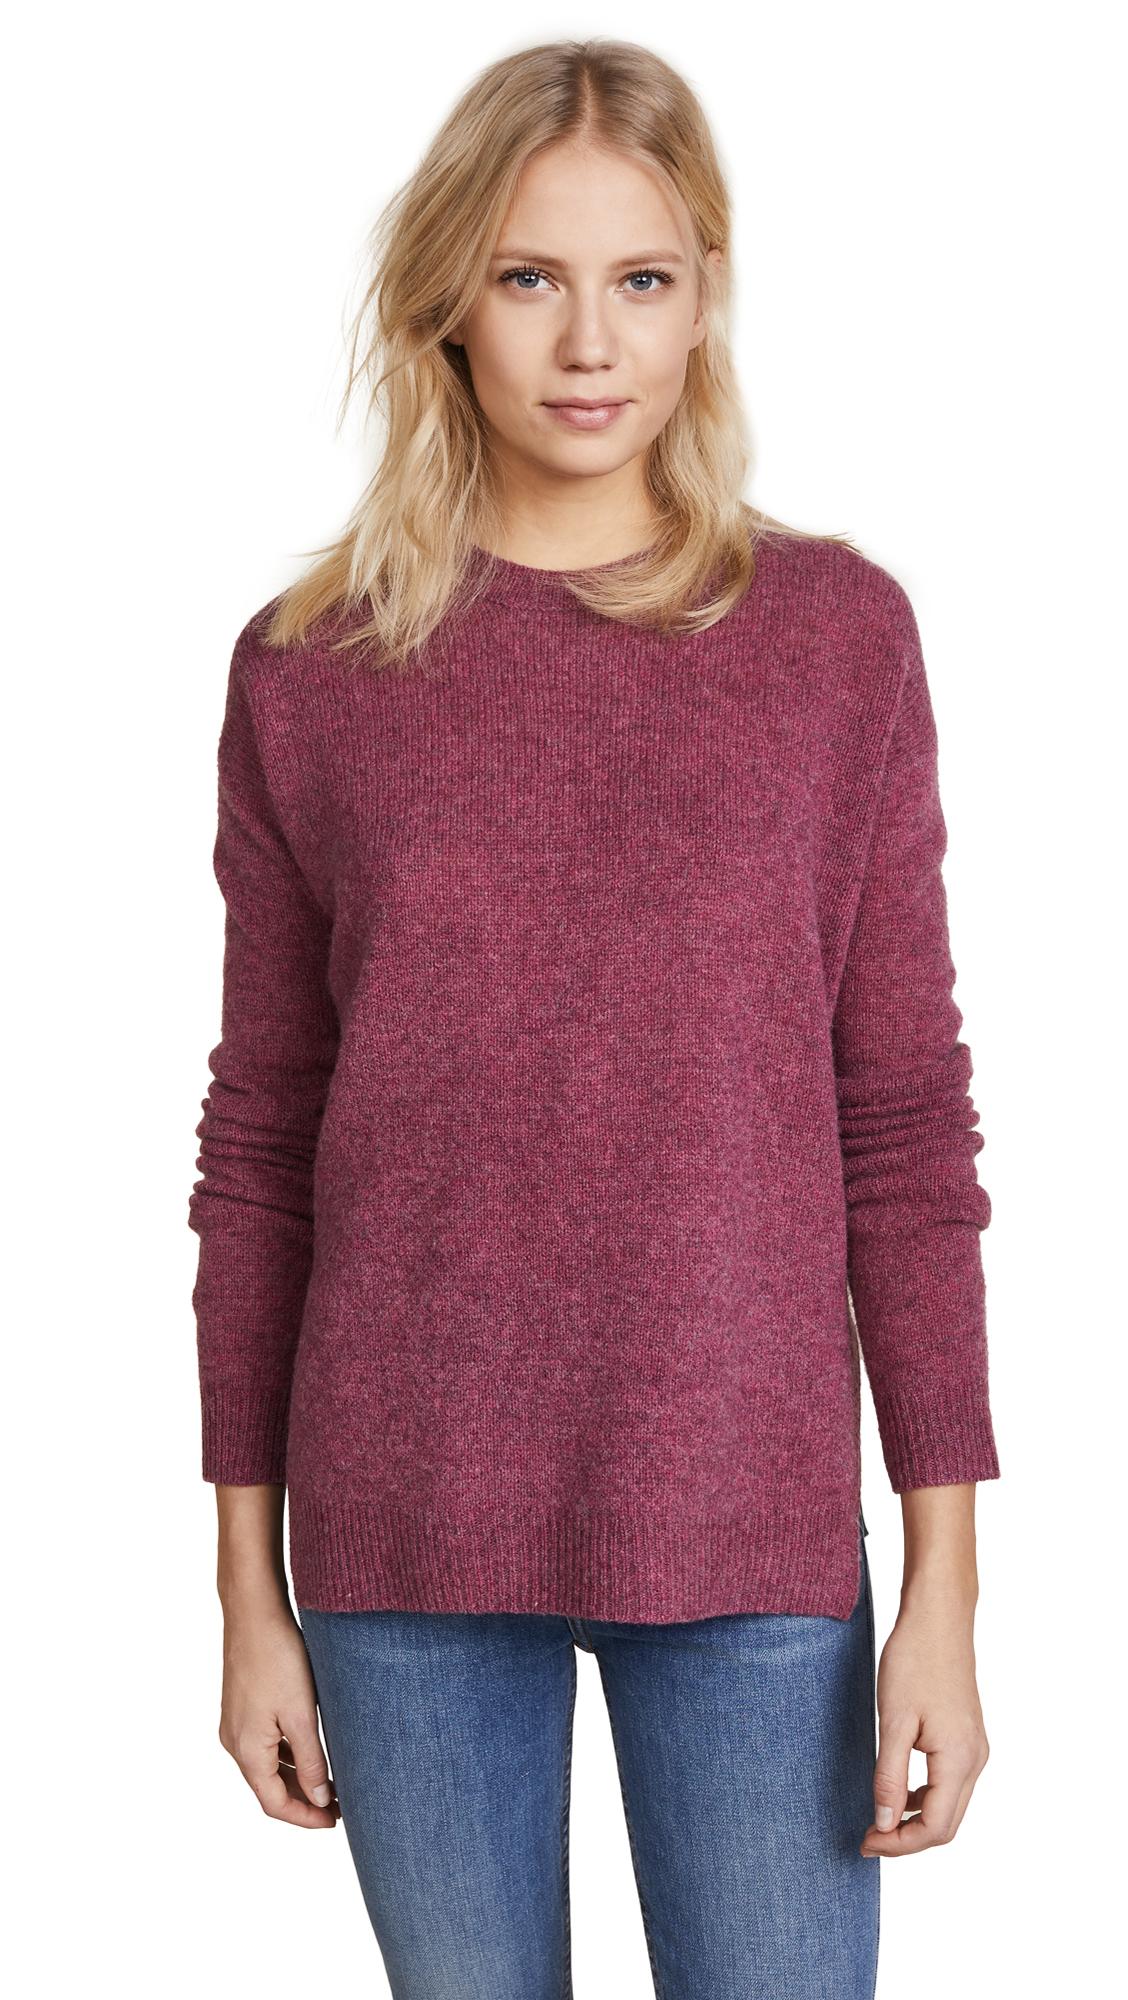 Acne Studios Deniz Wool Sweater - Pink Melange